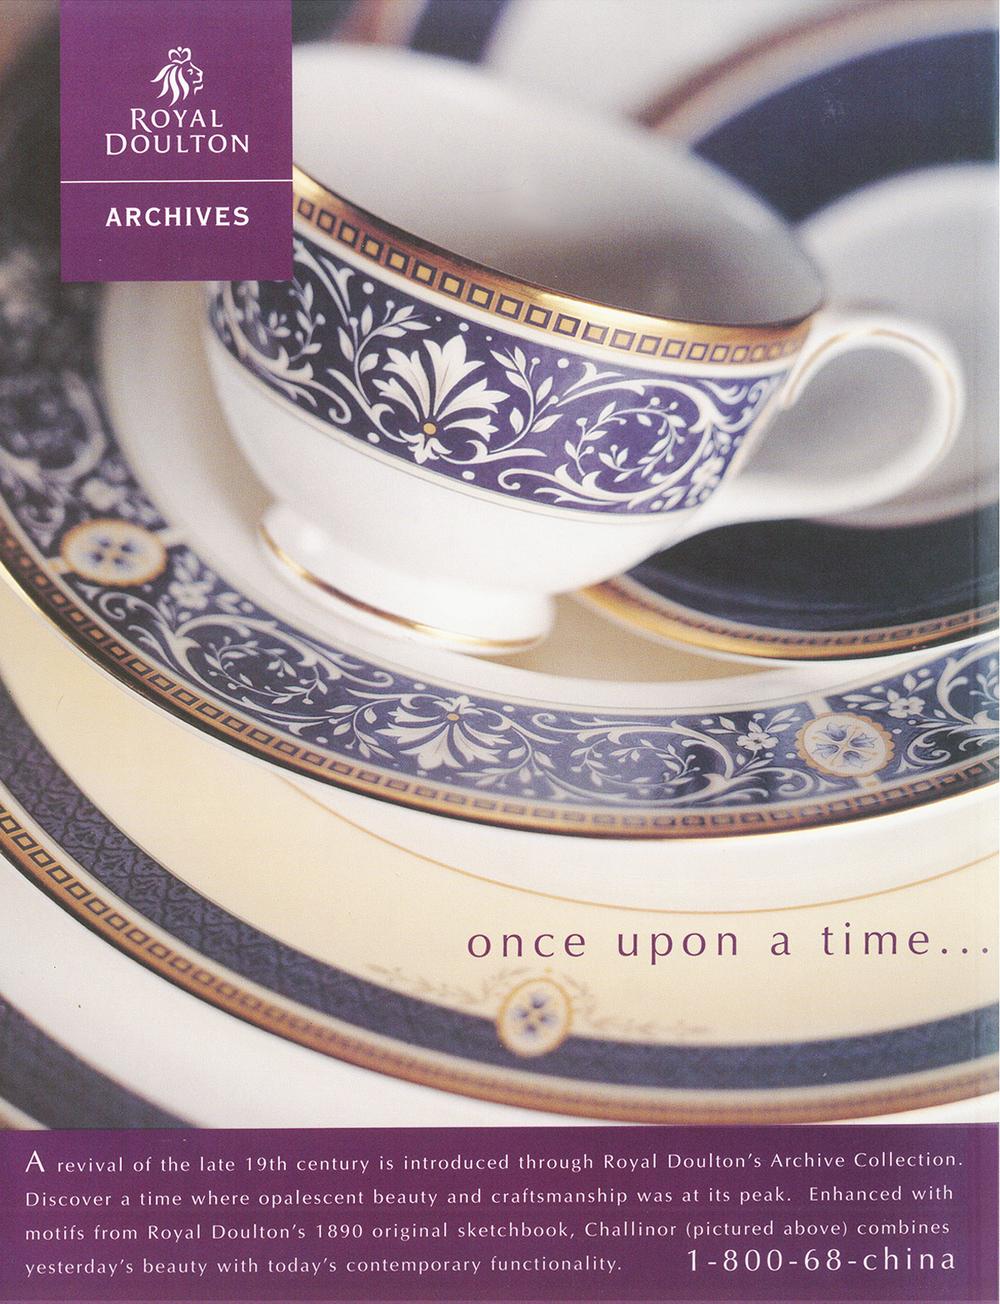 BridesMagazineRearCover.jpg